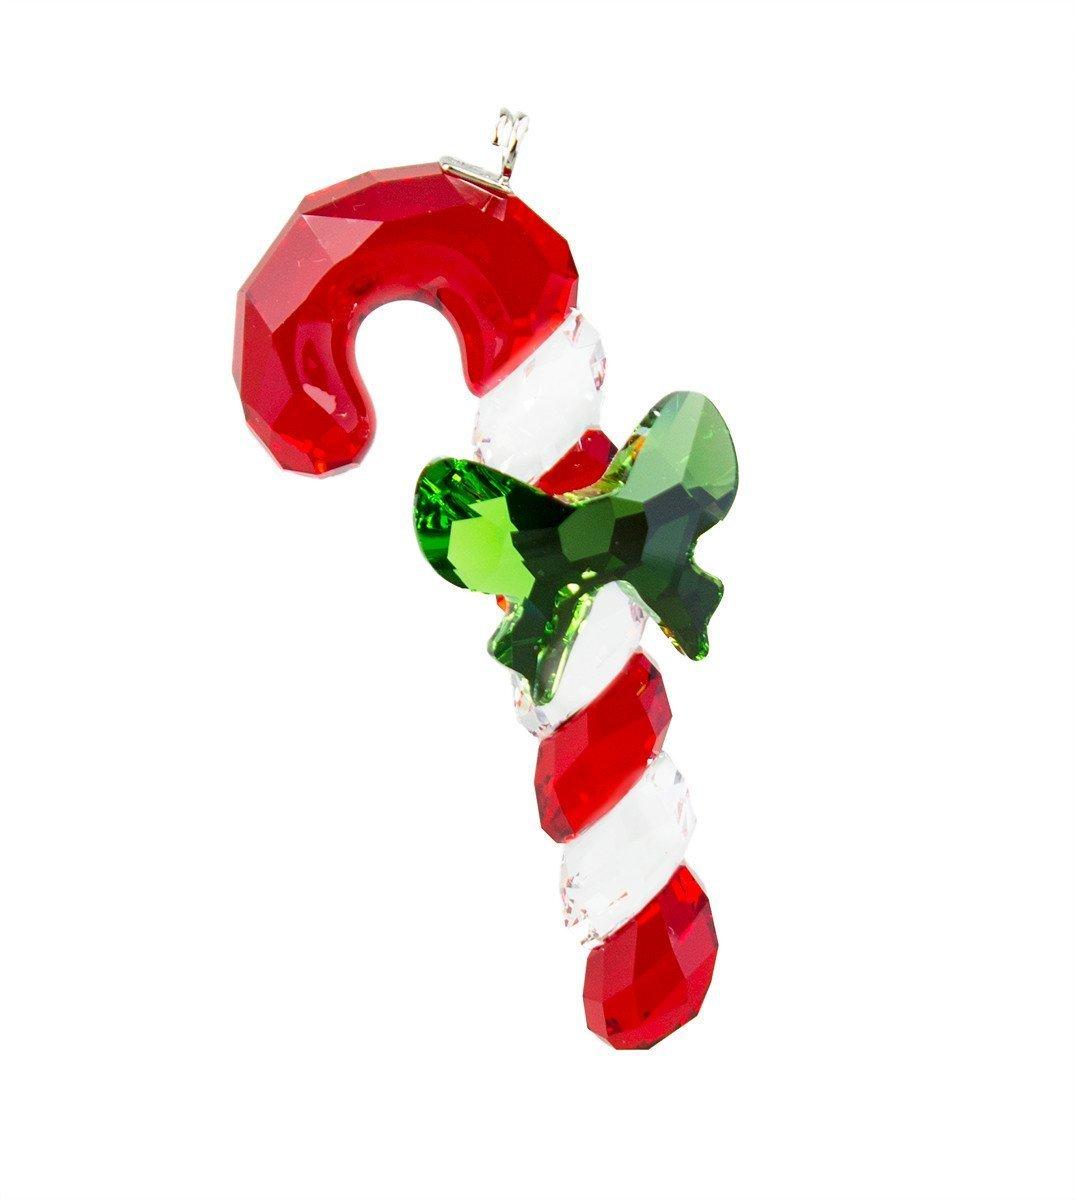 Amazon.com: Swarovski Candy Cane Ornament: Home & Kitchen